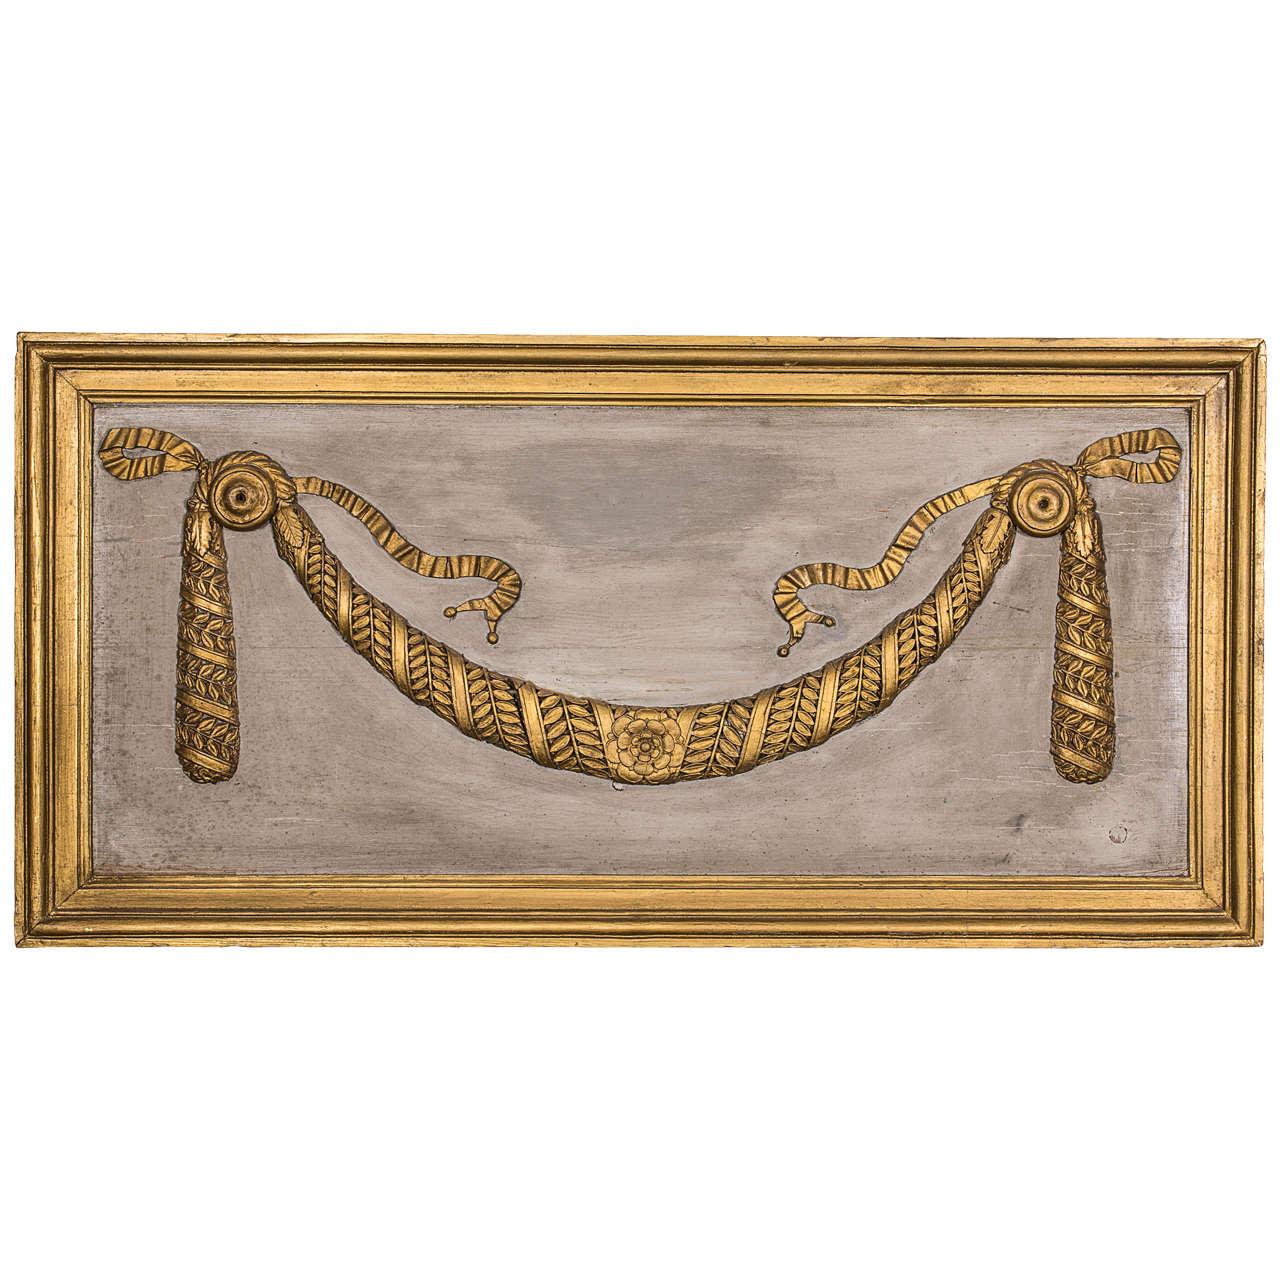 Italian, 18th Century Decorative Panel